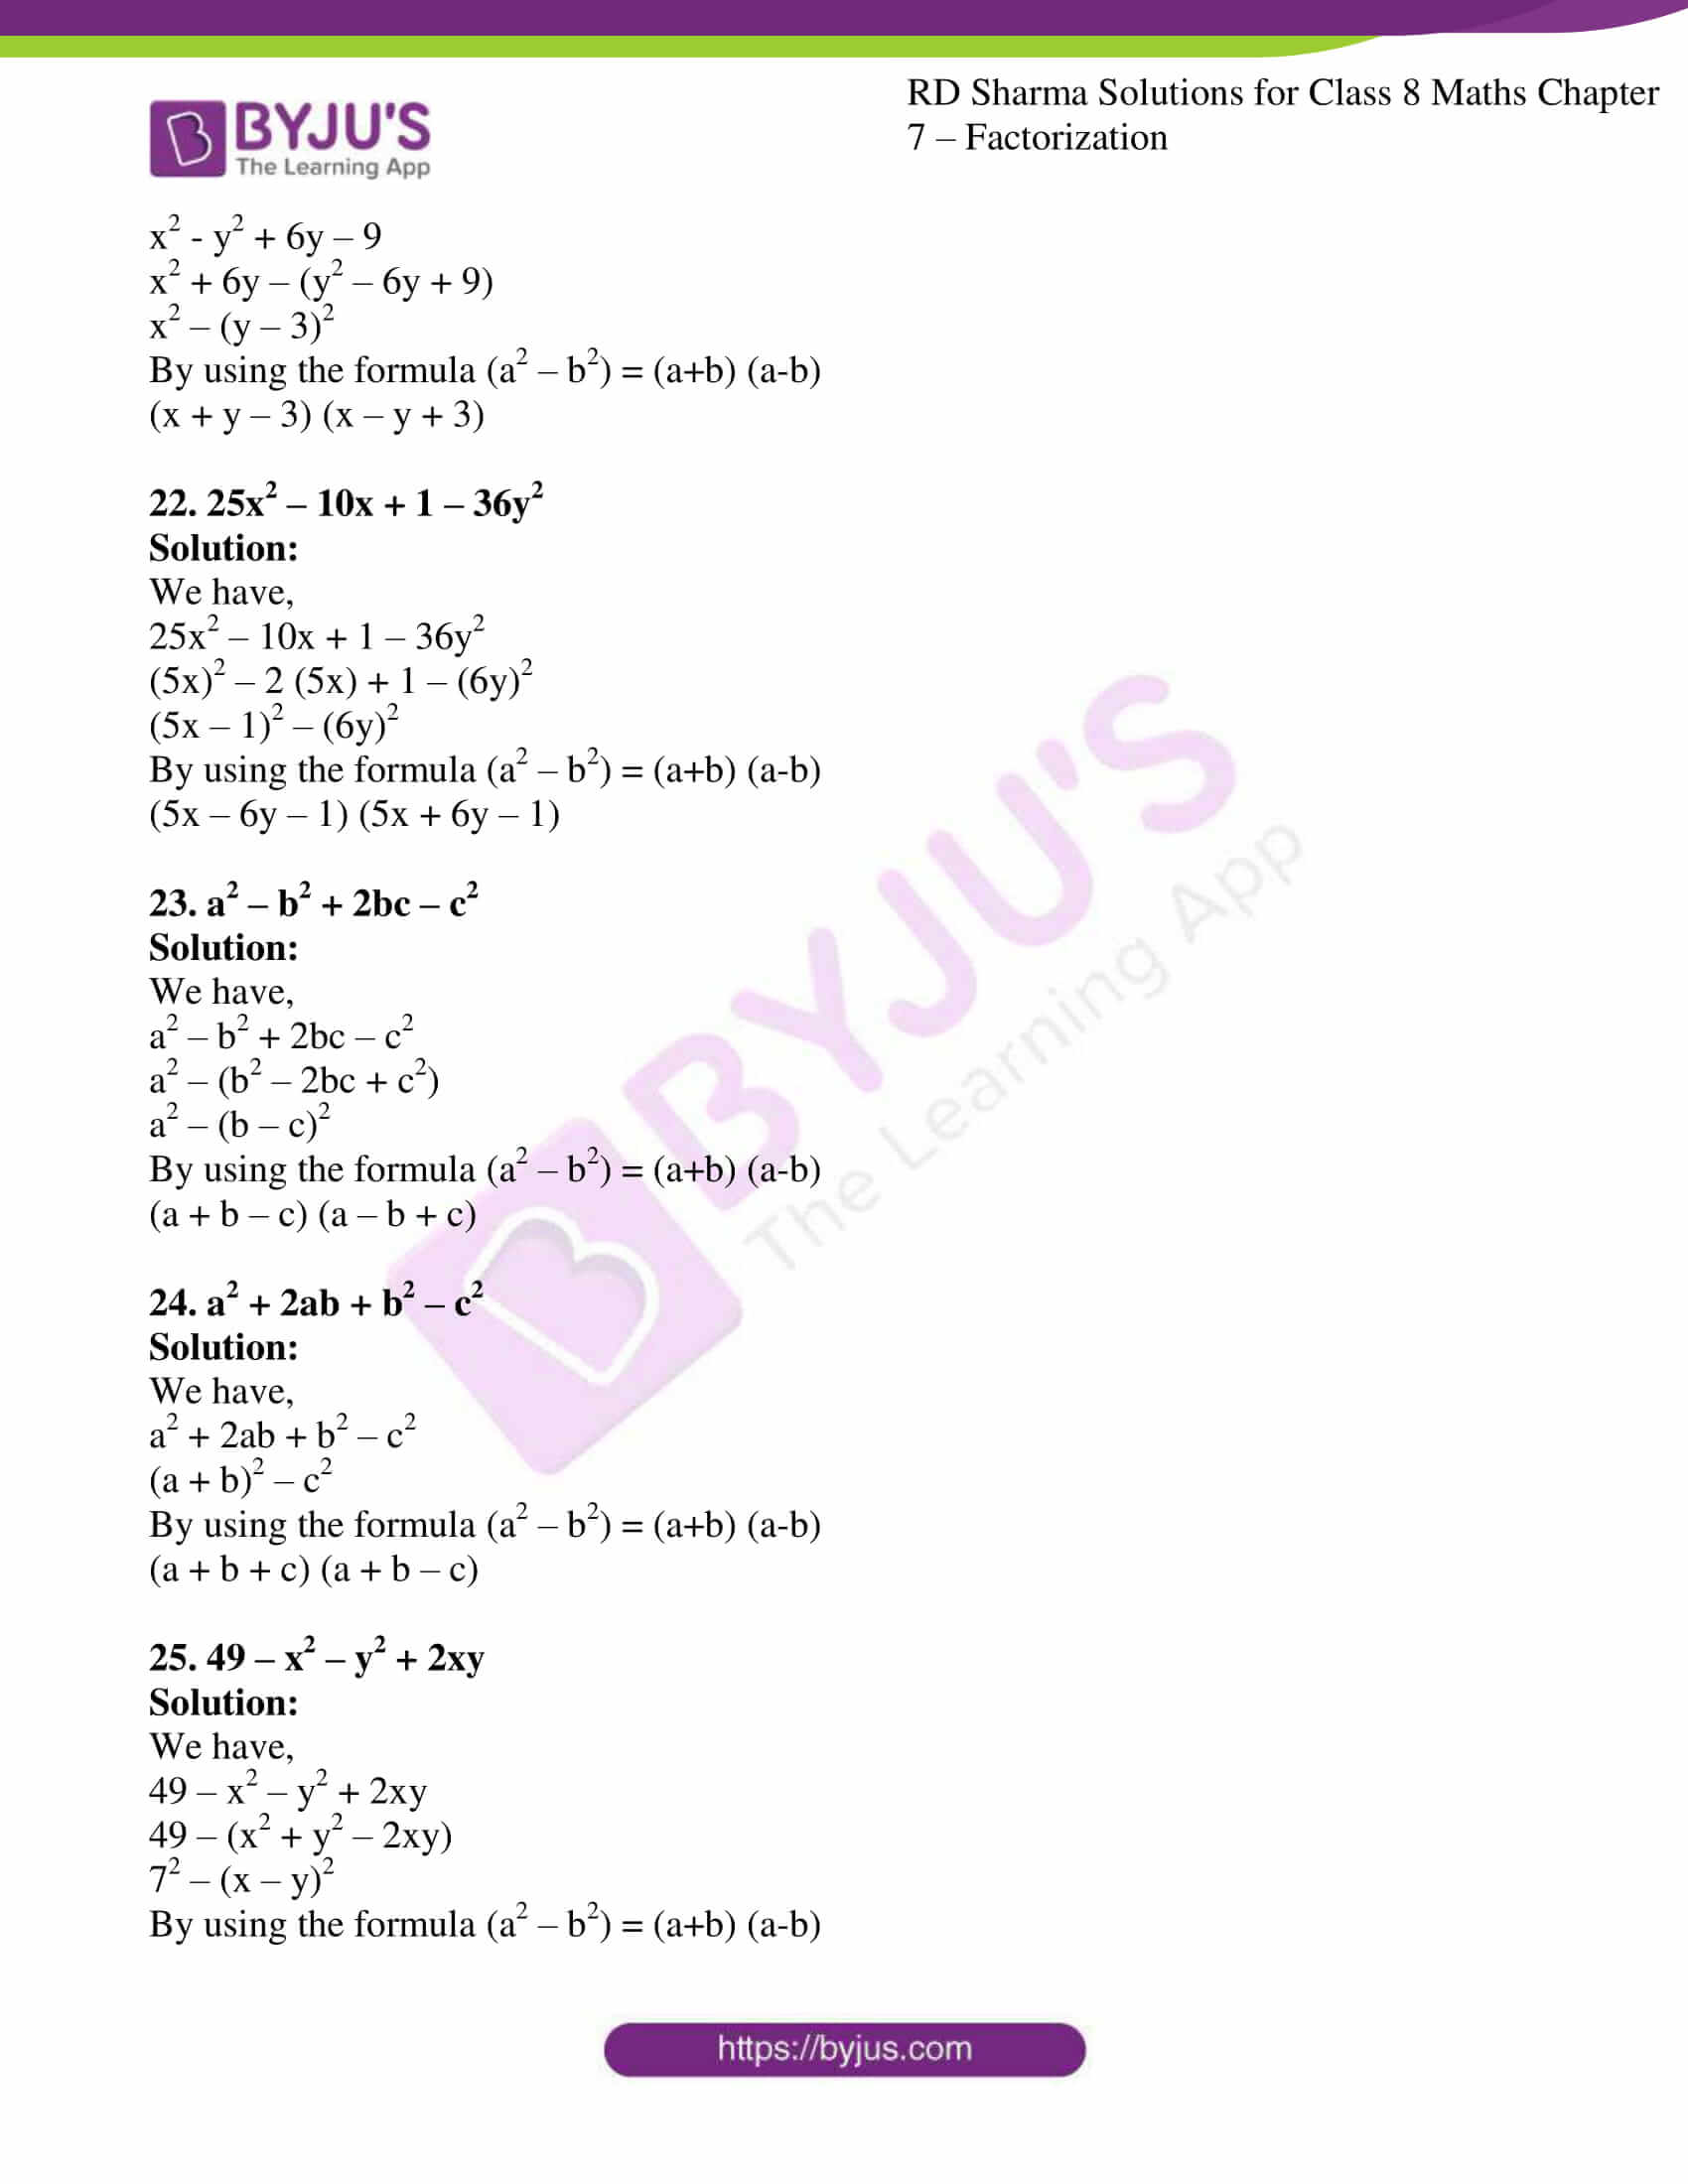 rd sharma class 8 maths chapter 7 exercise 6 6